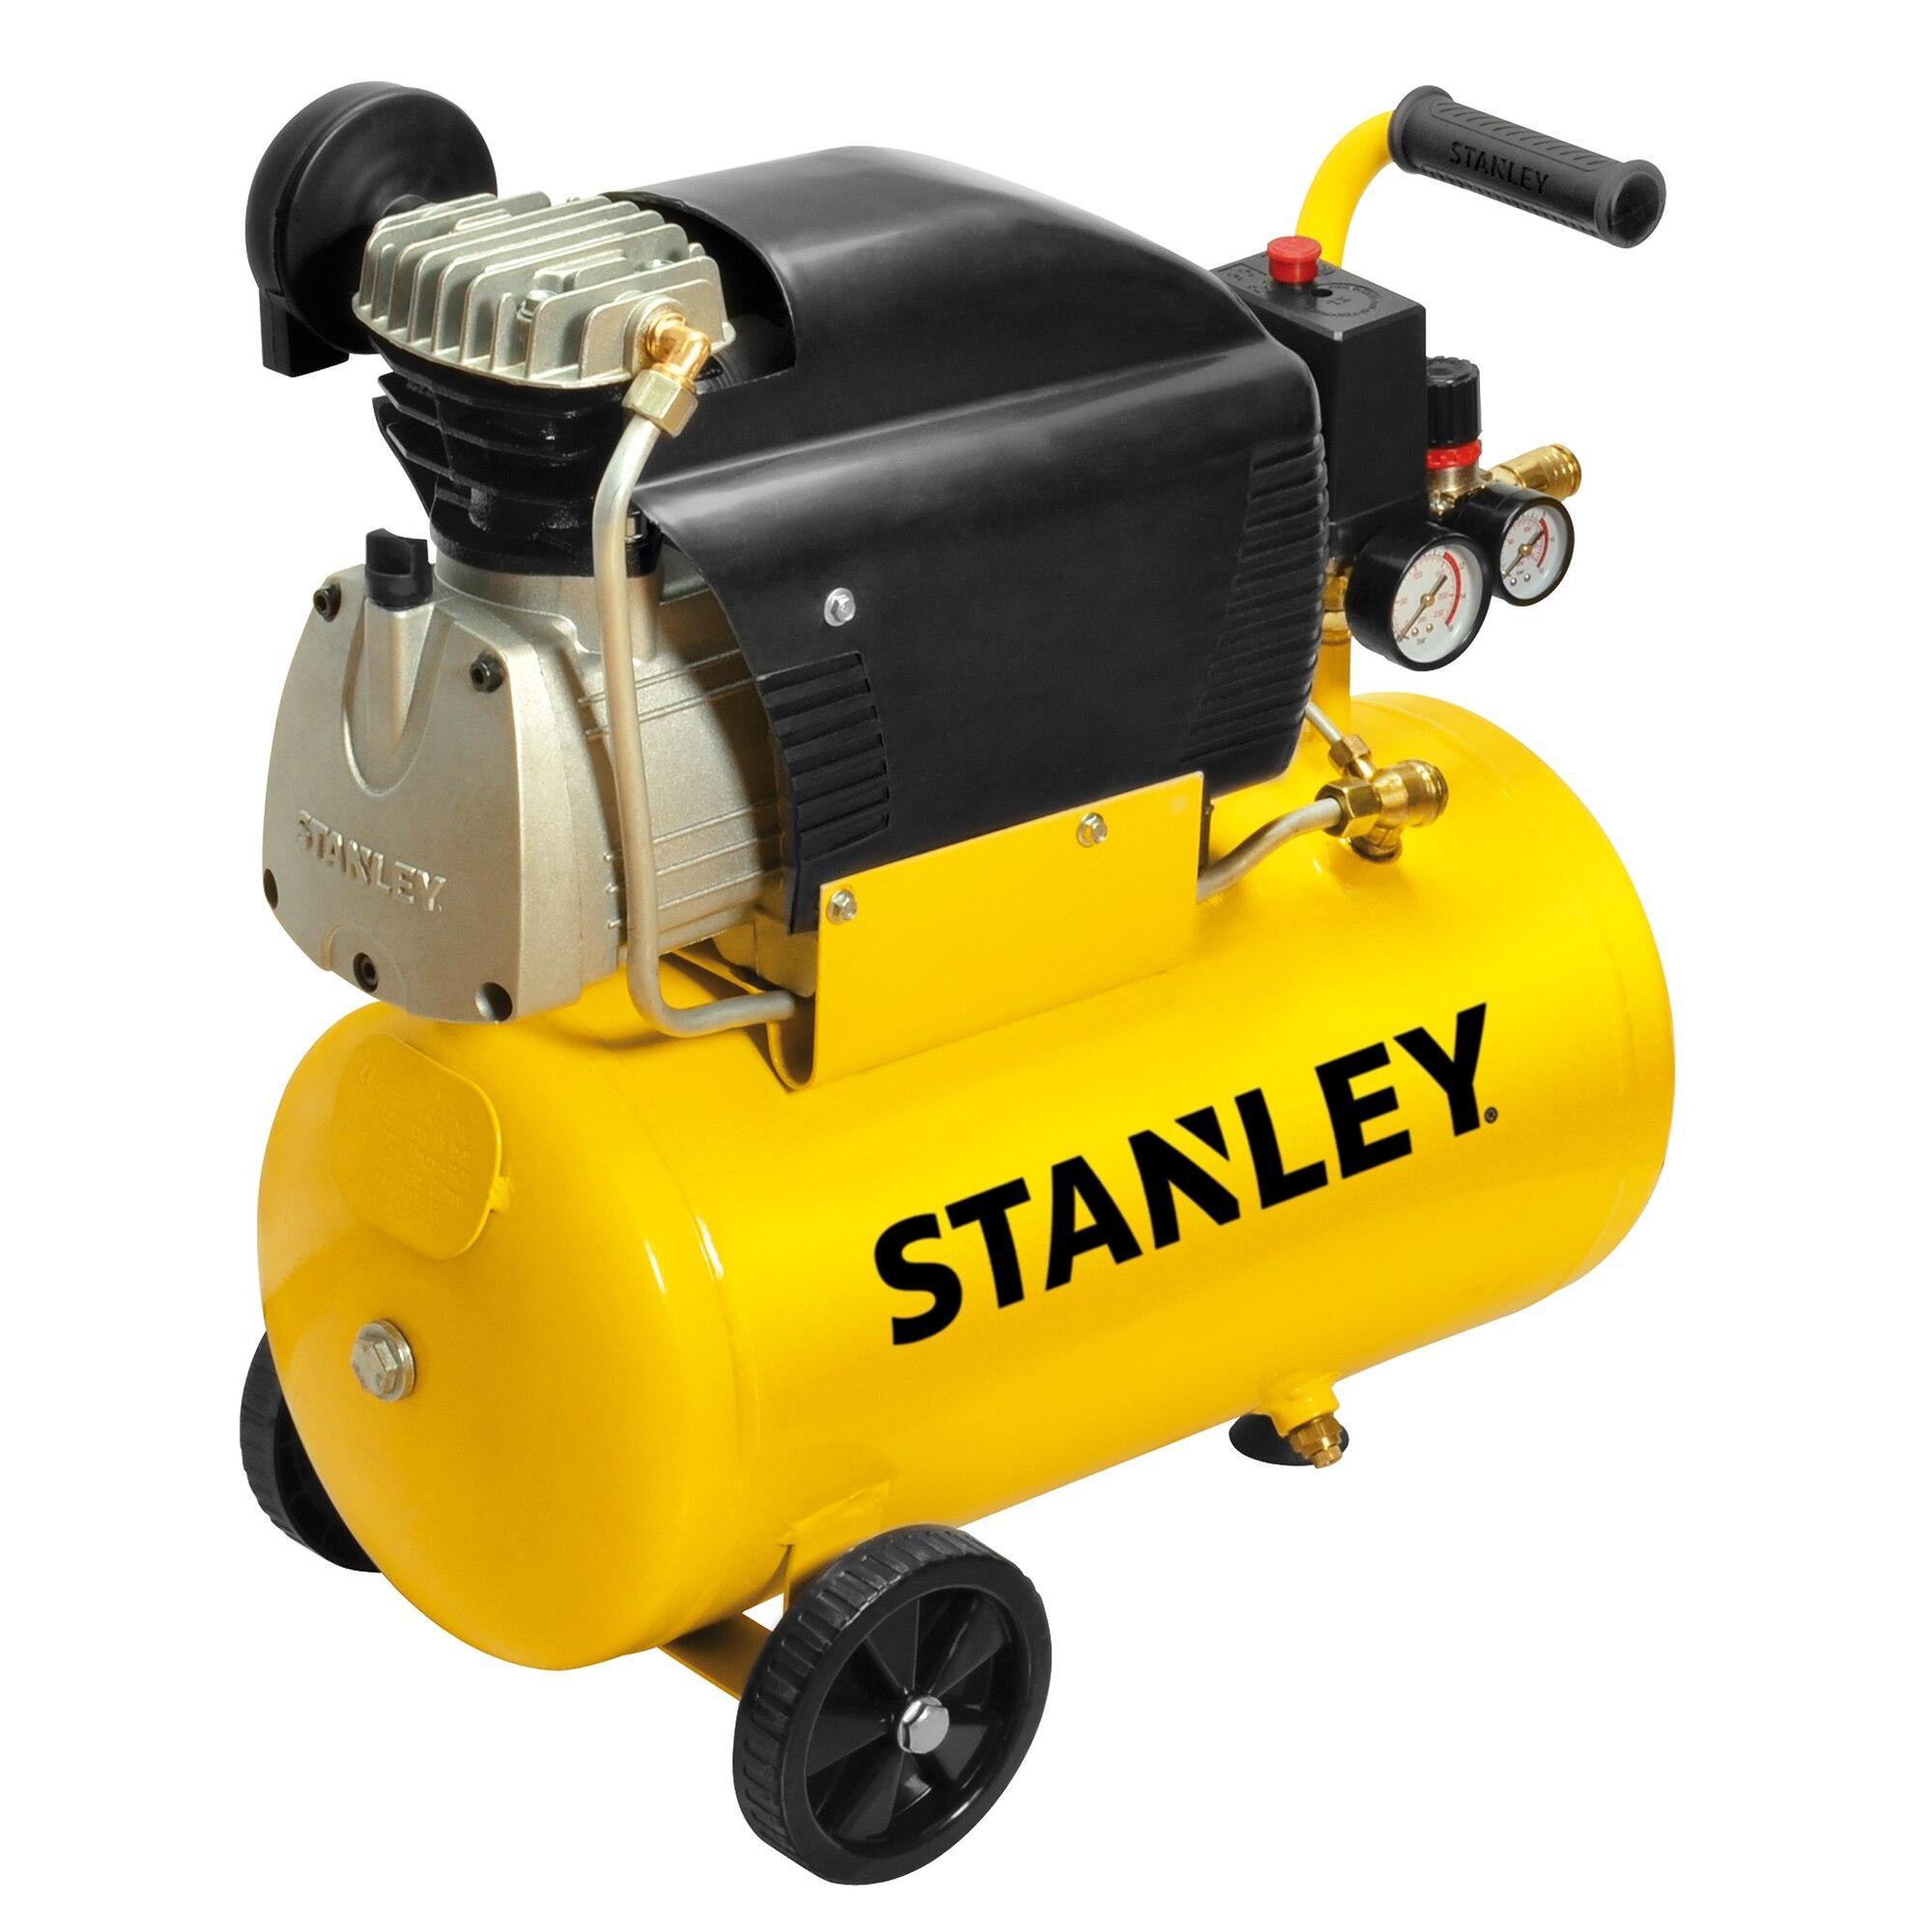 Fotografie Compresor aer profesional Stanley D211, 2 CP, 24 l capacitate rezervor, 8 bar presiune lucru, 222 l/min debit aer